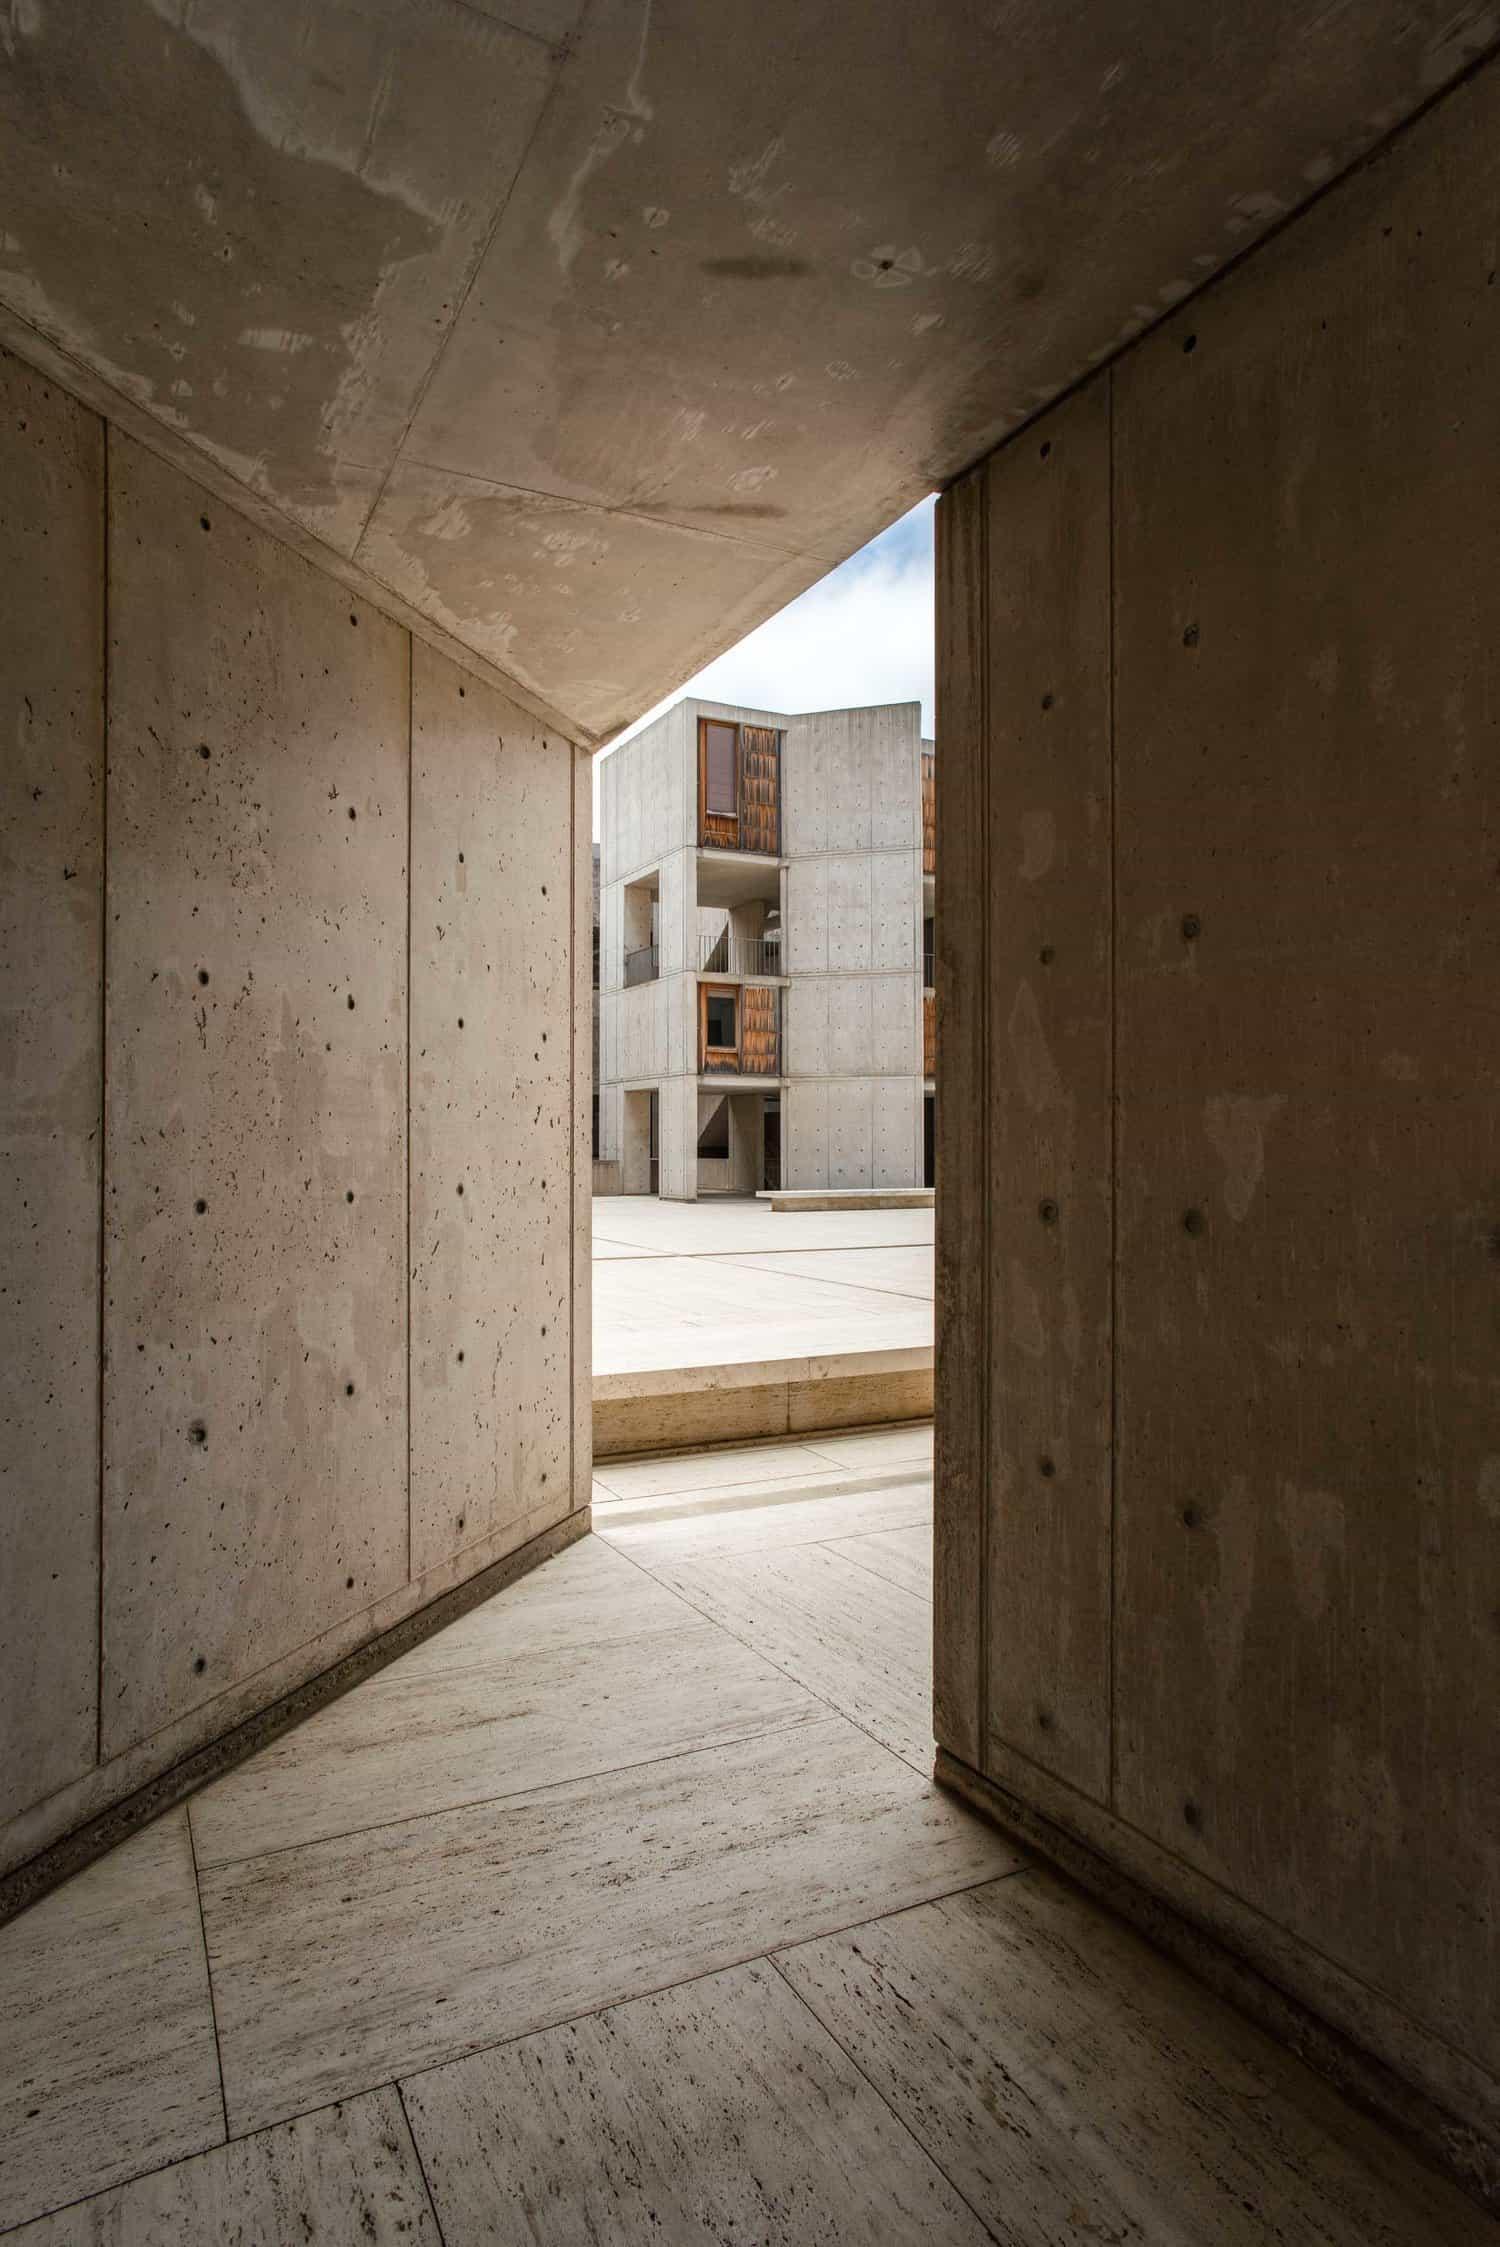 Paul Vu Photography – Salk Institute – Architectural Photography 004